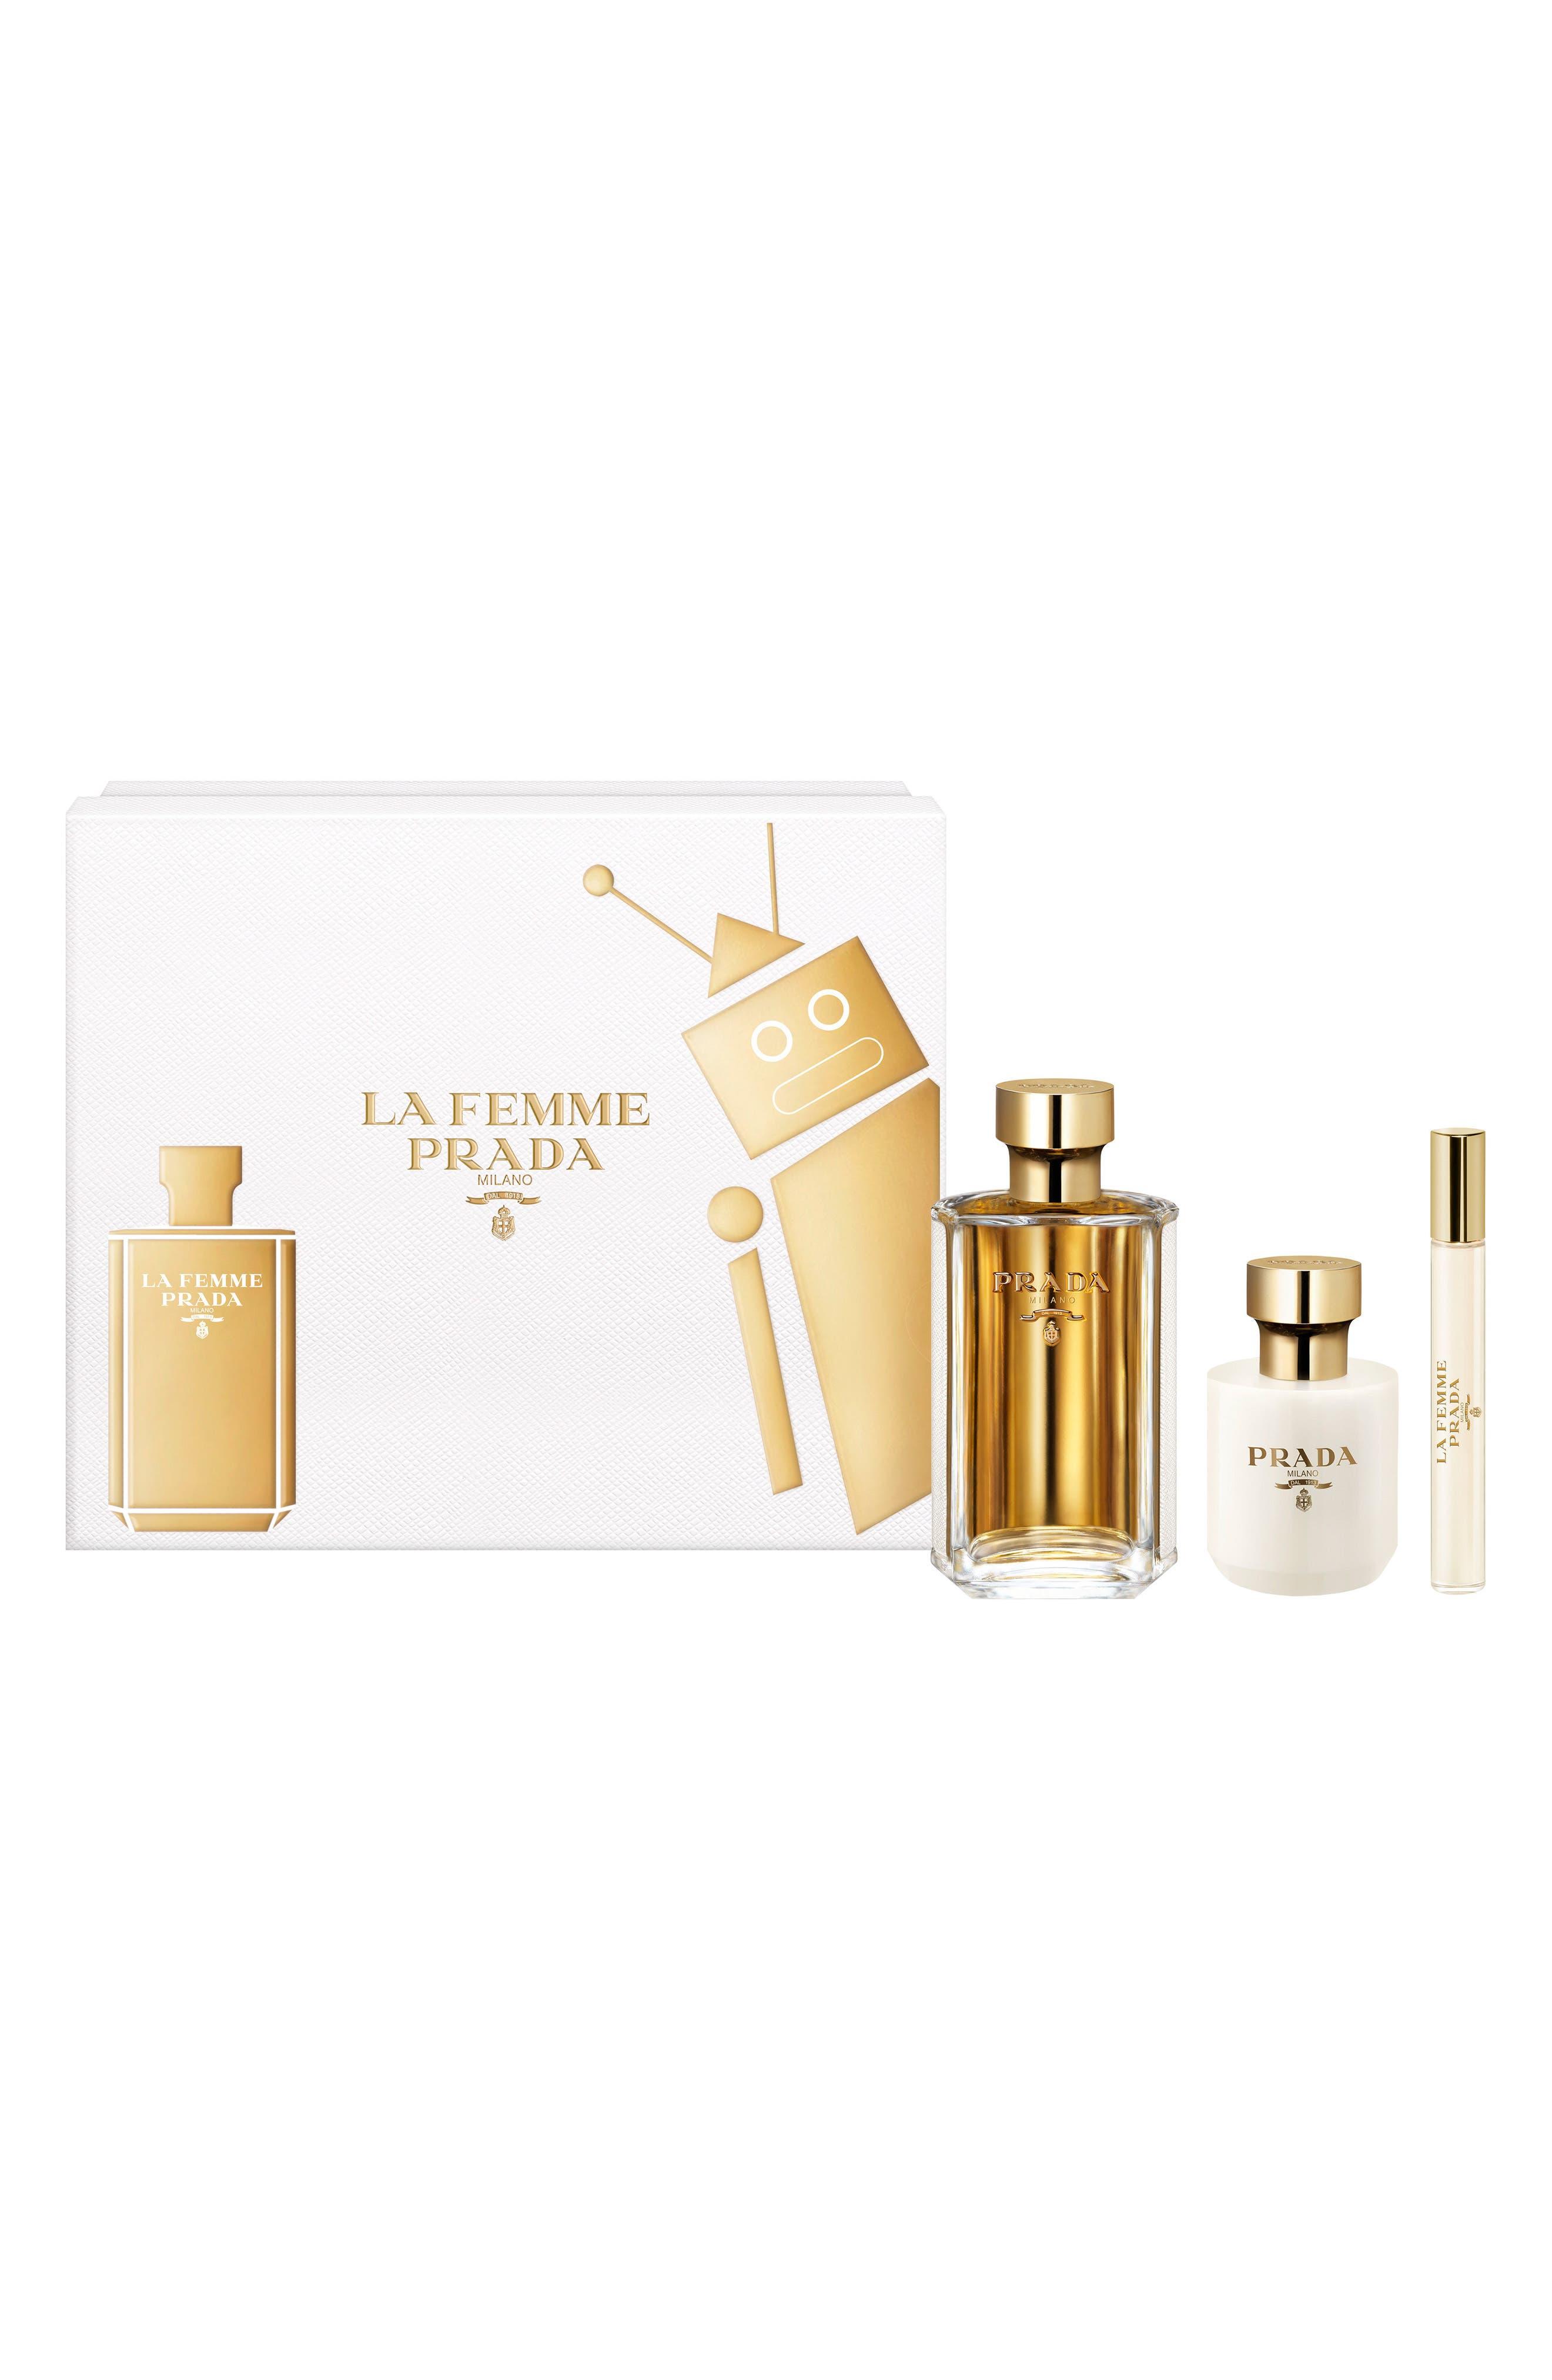 Main Image - Prada La Femme Prada Set ($182 Value)